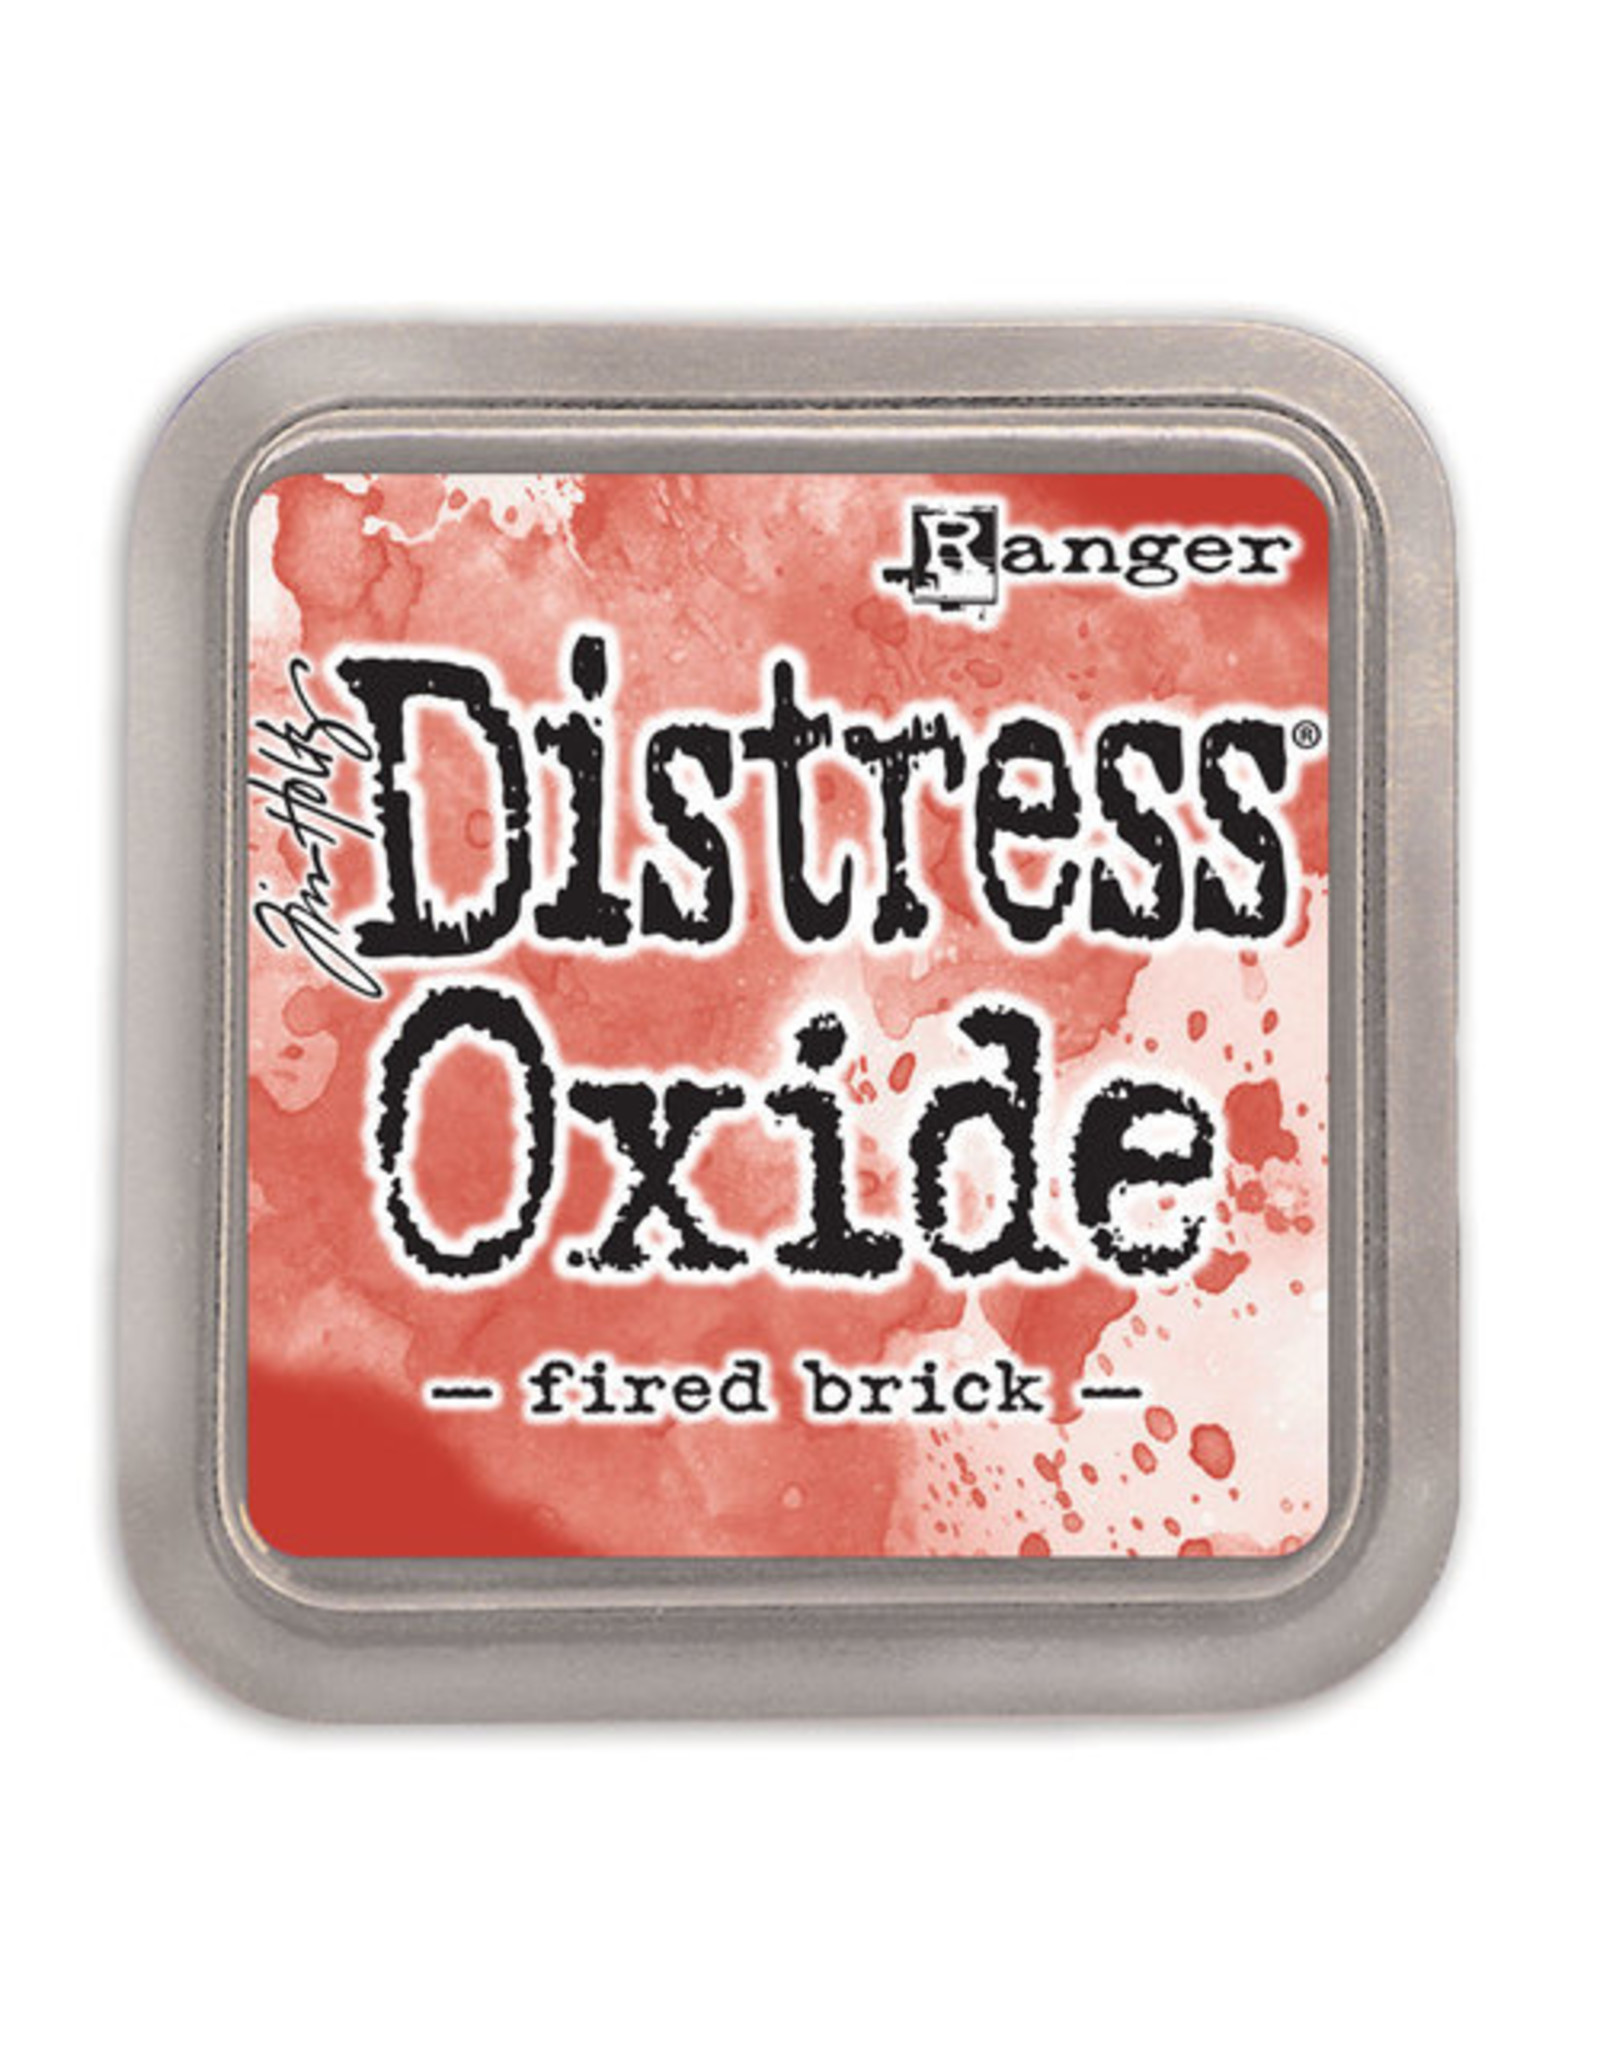 Ranger Distress Oxide Ink Pad - Fired Brick